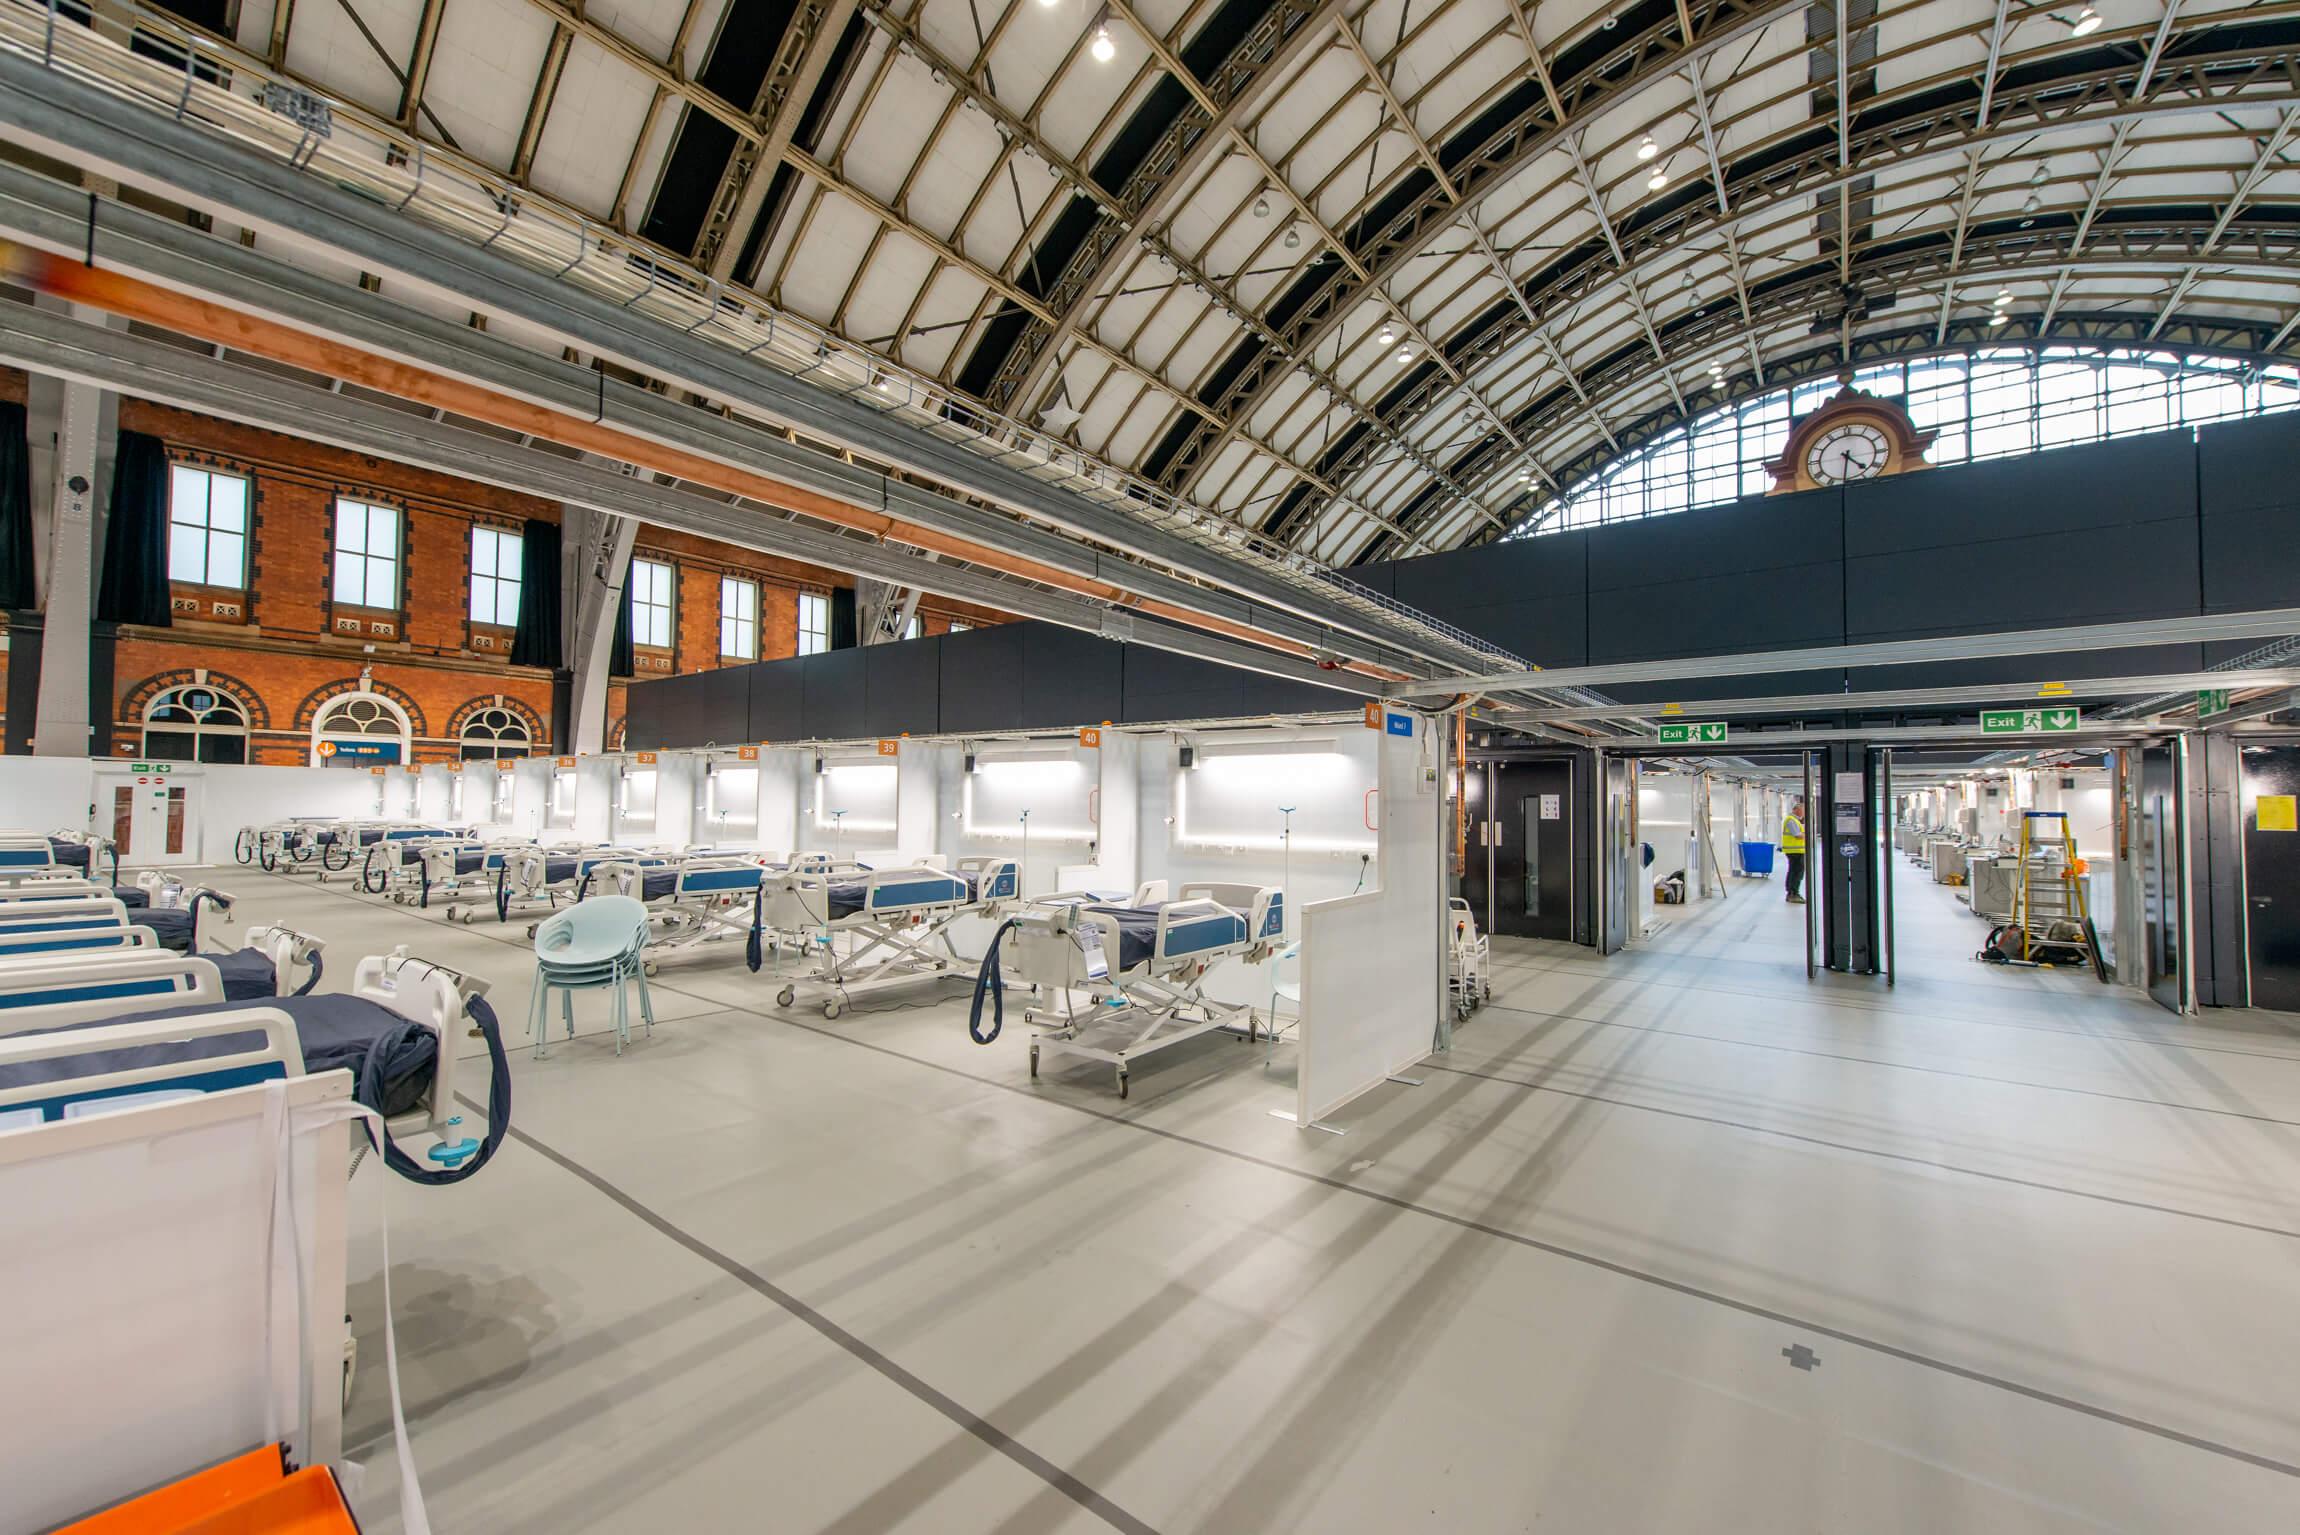 JCS Work Around The Clock On Nightingale Hospital Projects